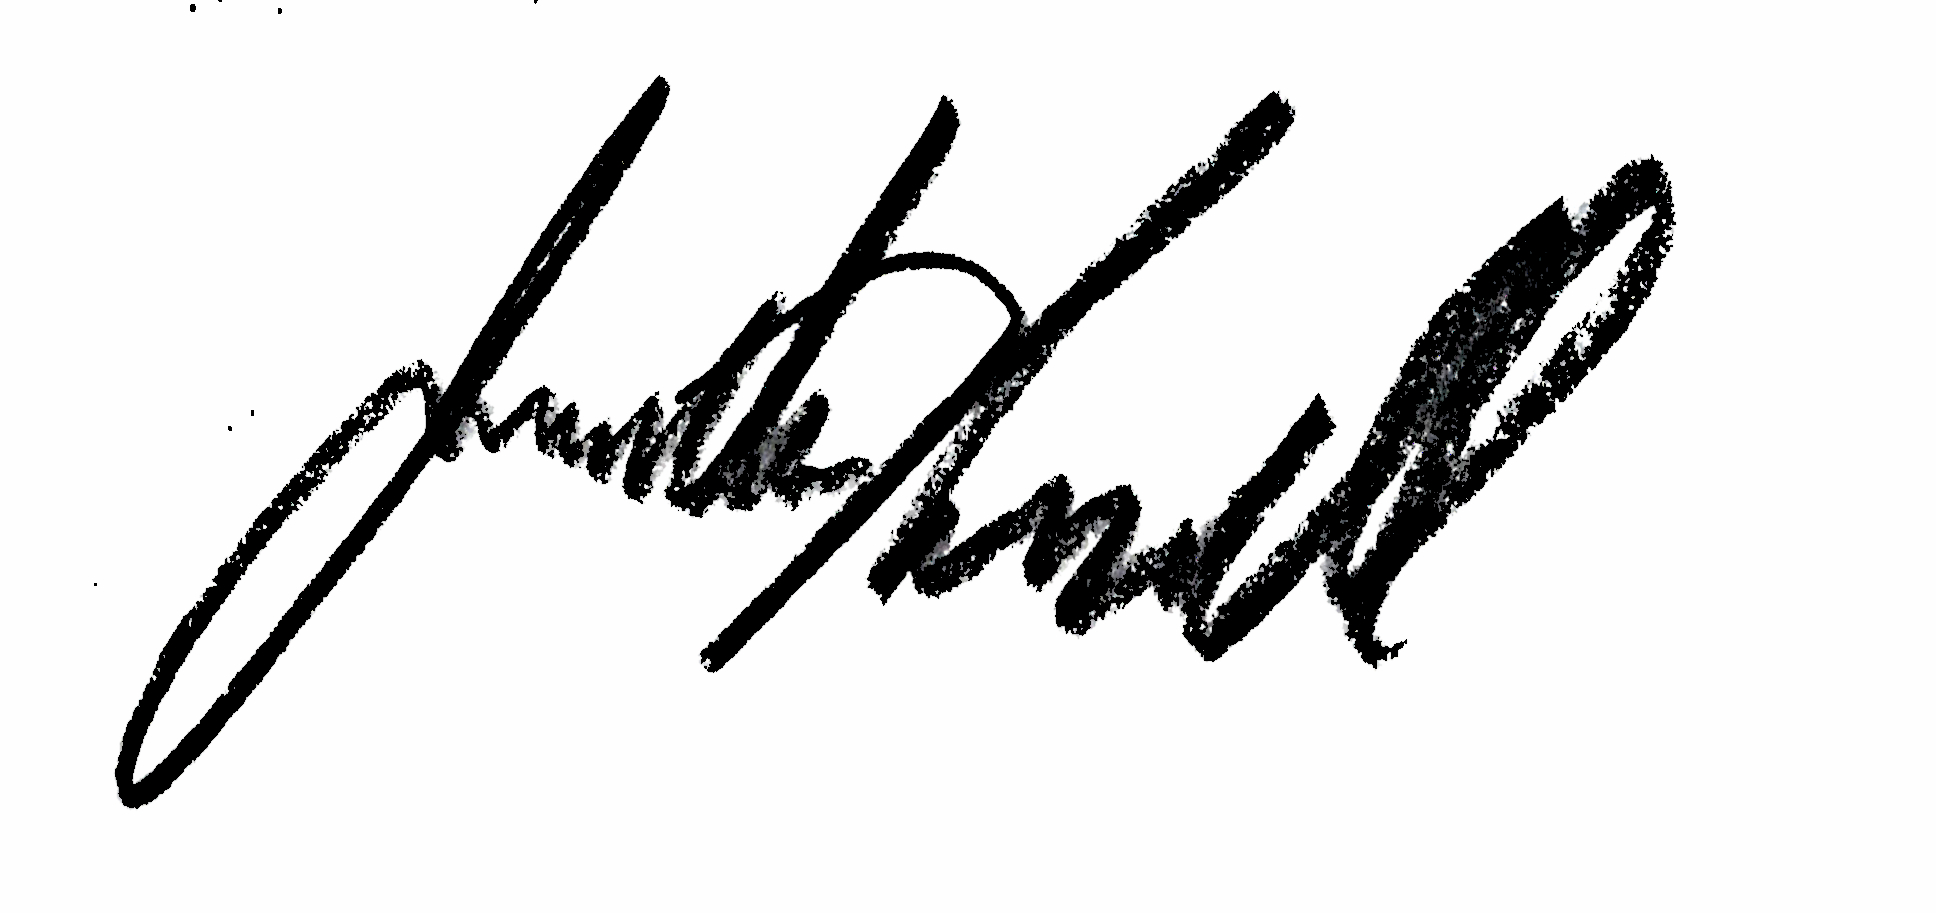 onojk123's Signature